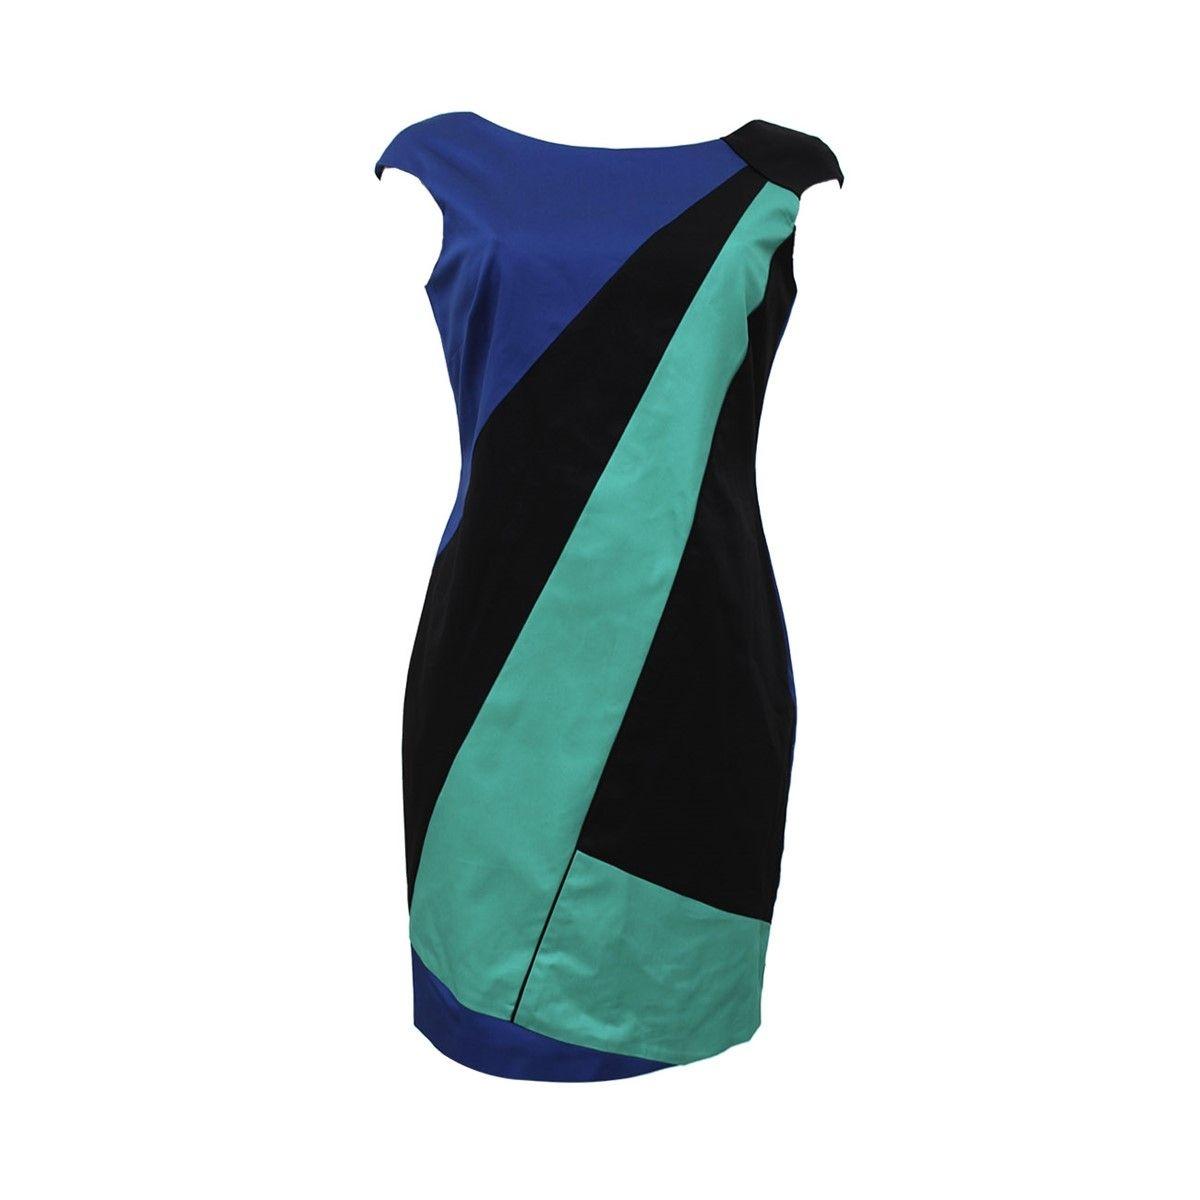 Robe Tricolore Ajustee